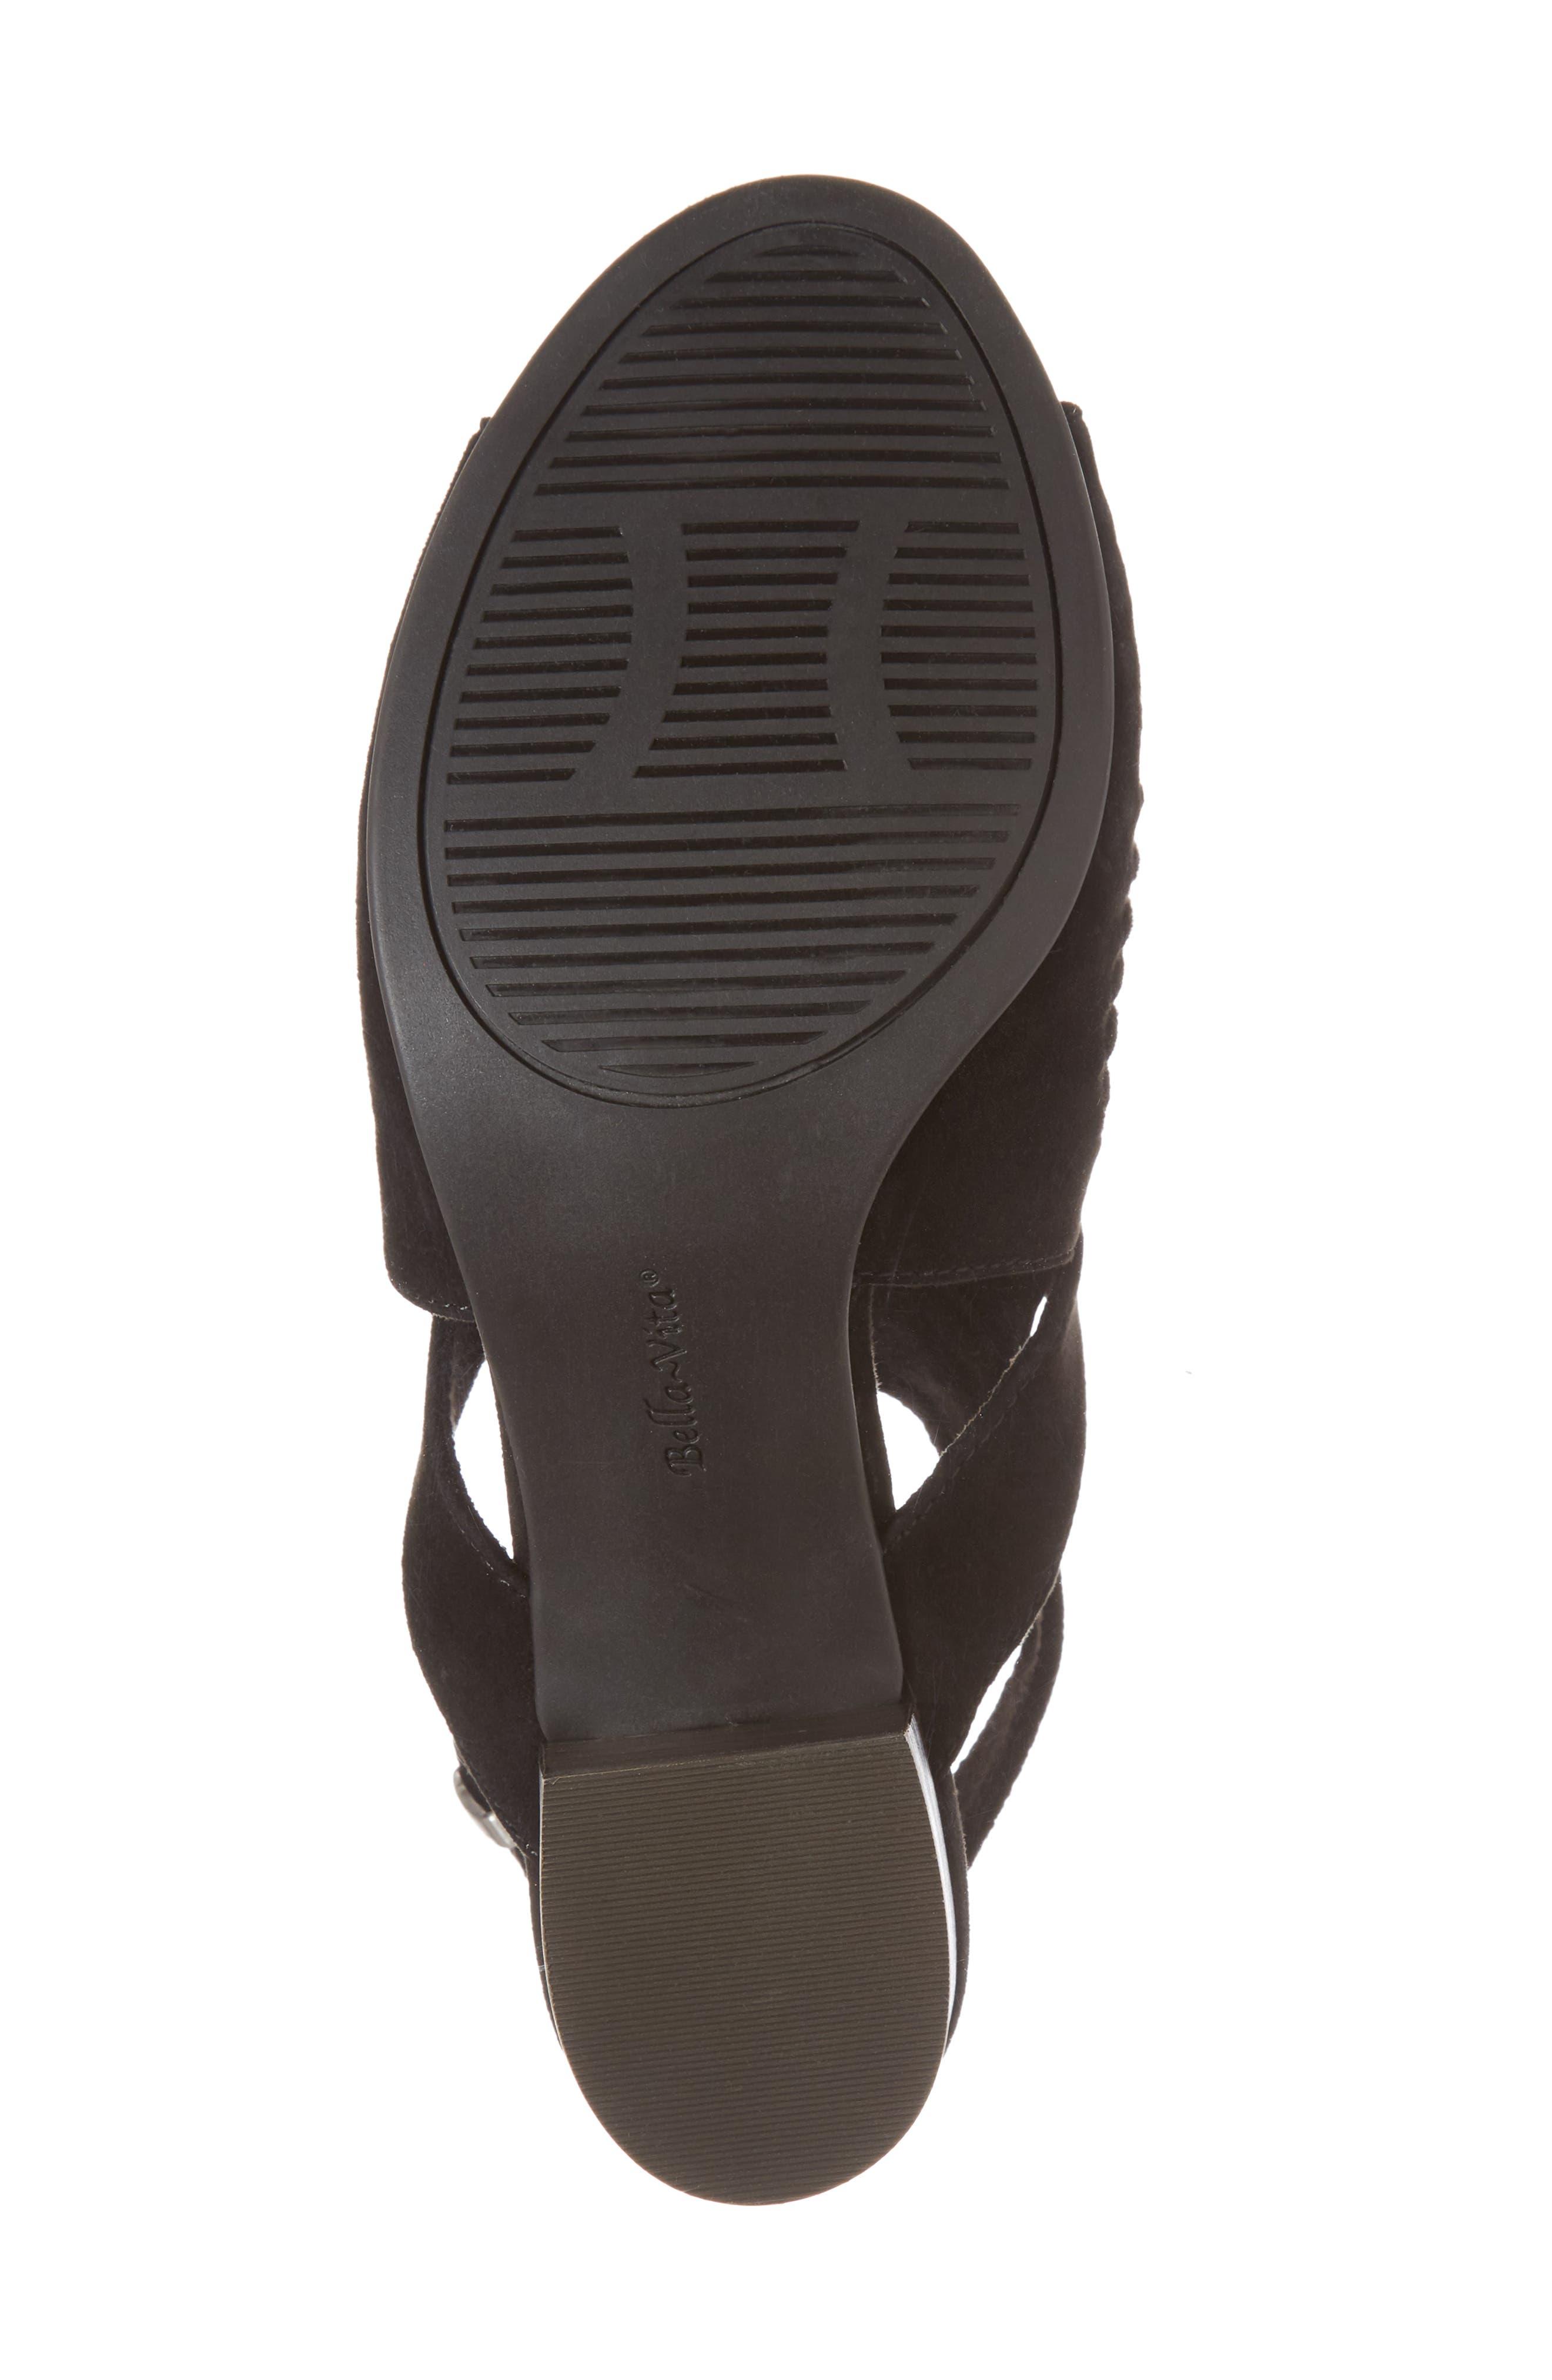 Finley Ankle Strap Sandal,                             Alternate thumbnail 6, color,                             Black Suede